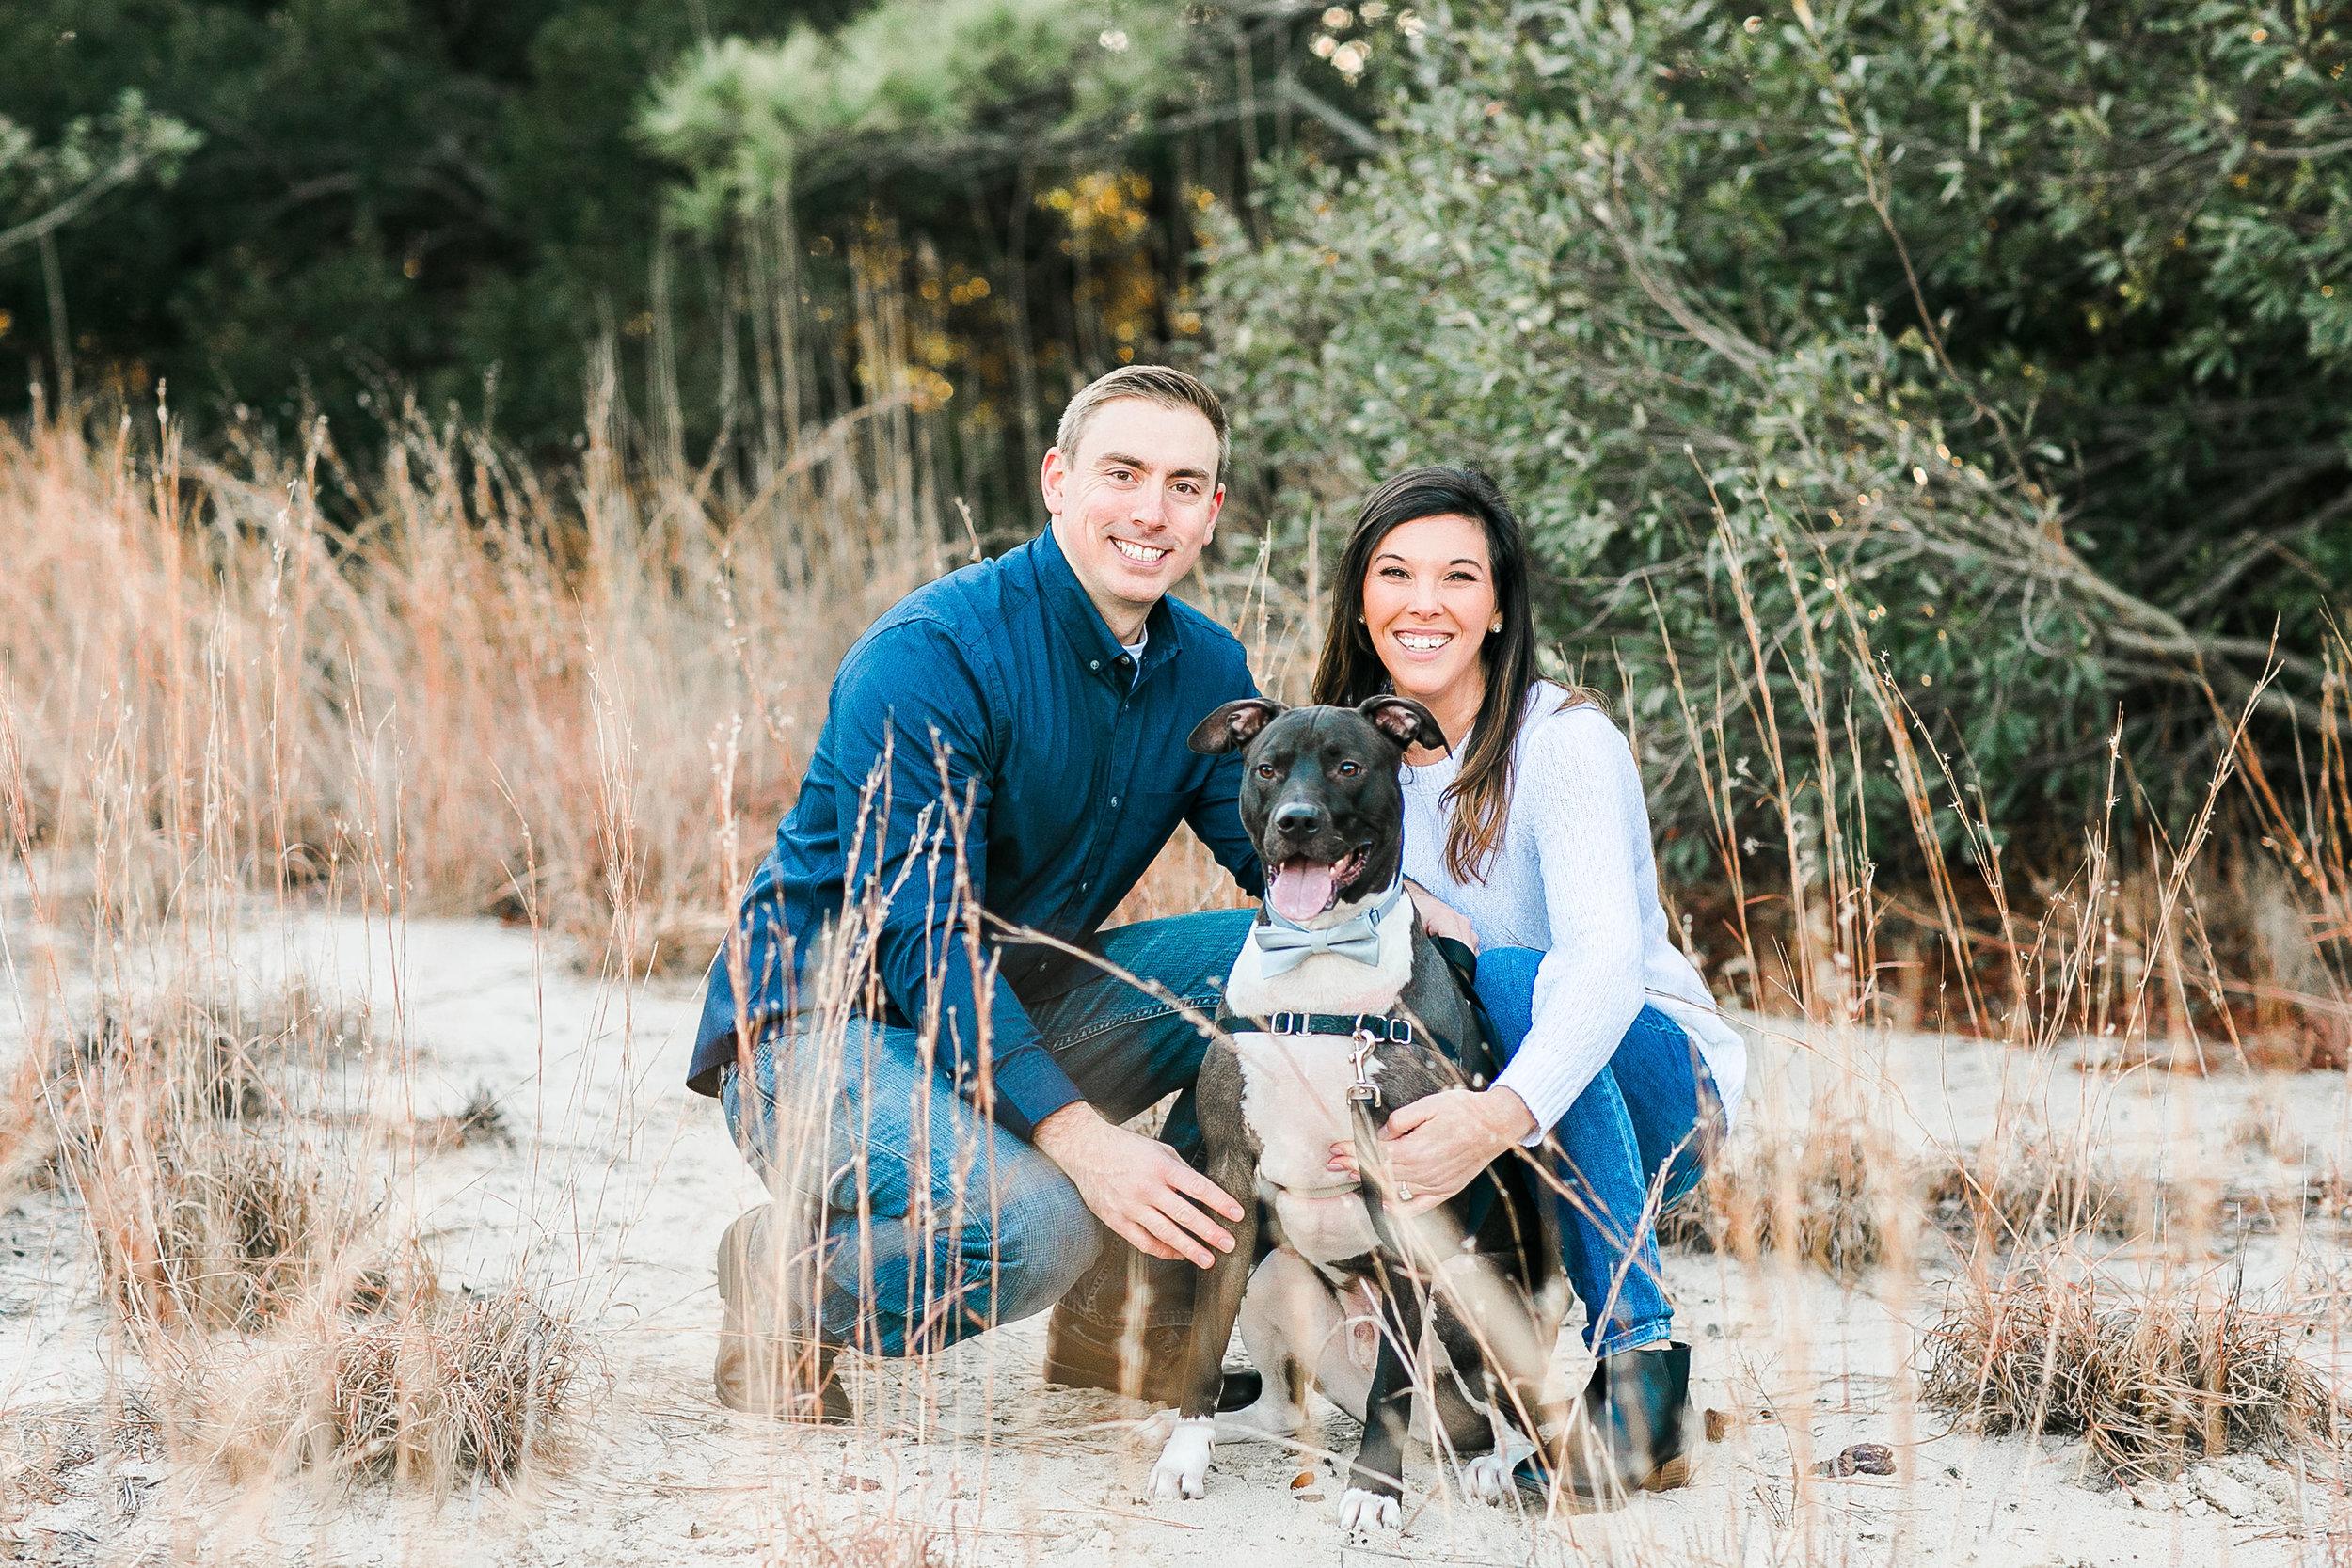 Nicole&Dustin_Engaged-23.jpg